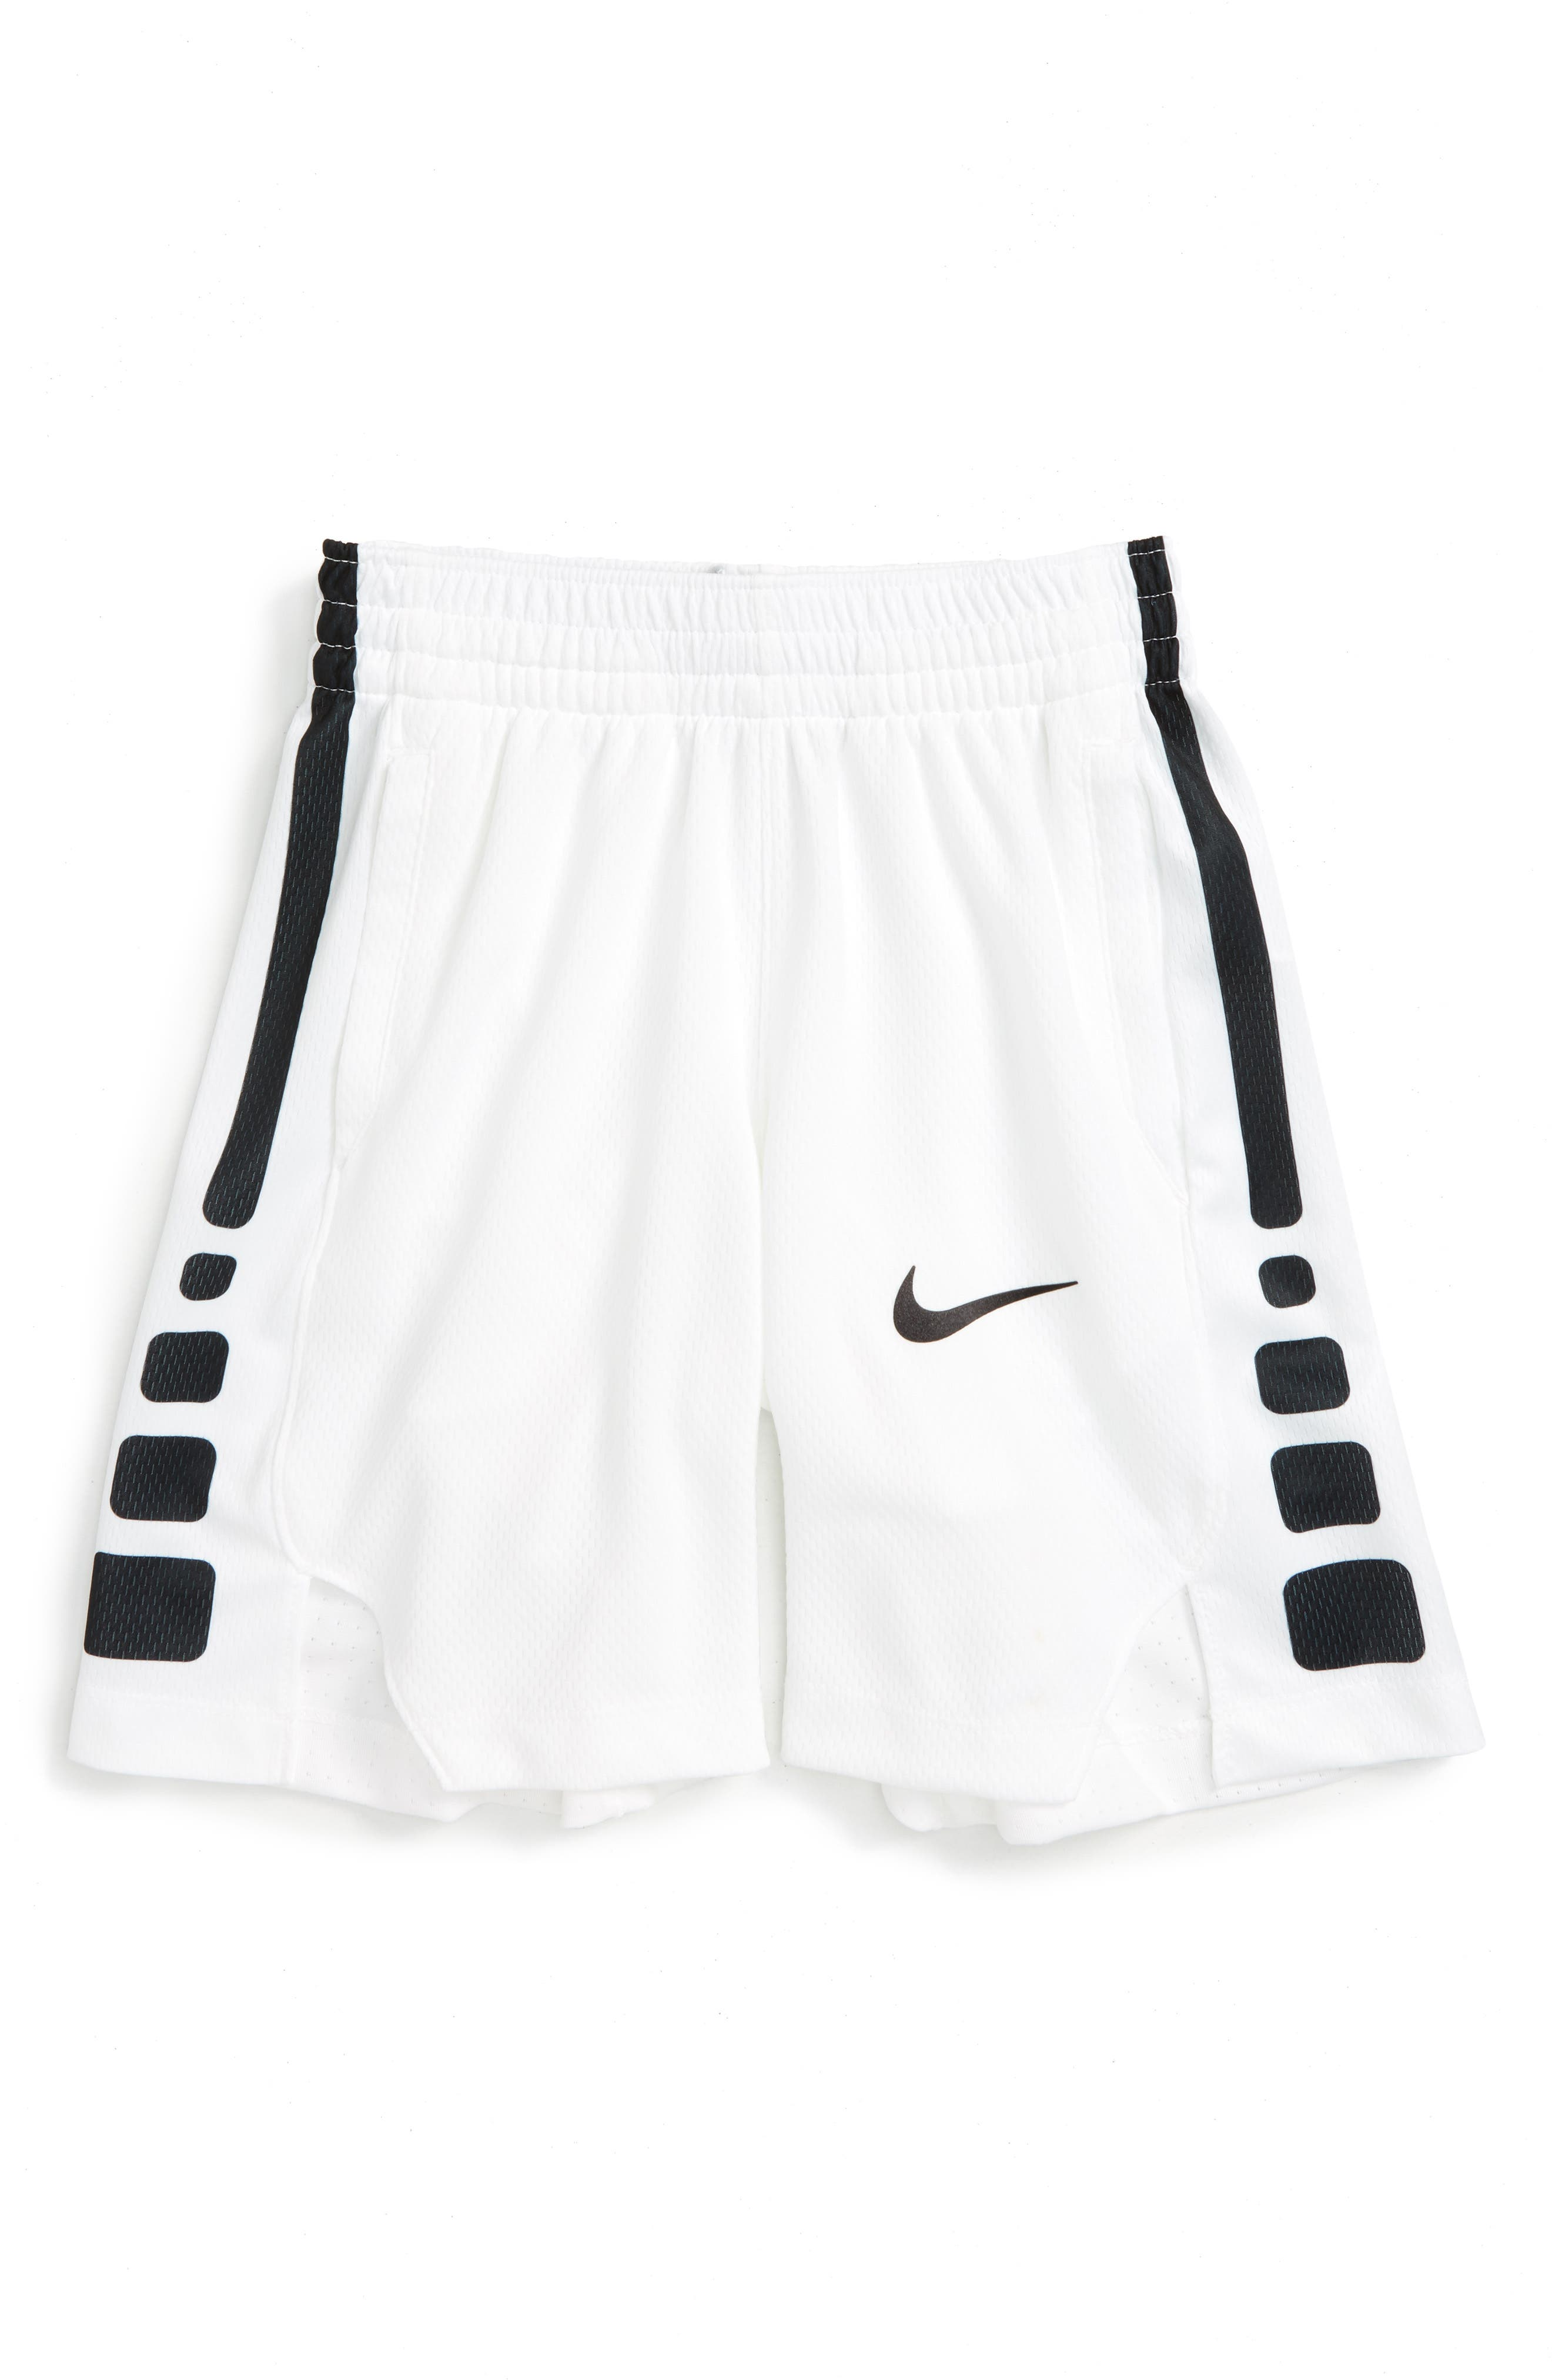 Dry Elite Basketball Shorts,                         Main,                         color, WHITEW/ BLACK